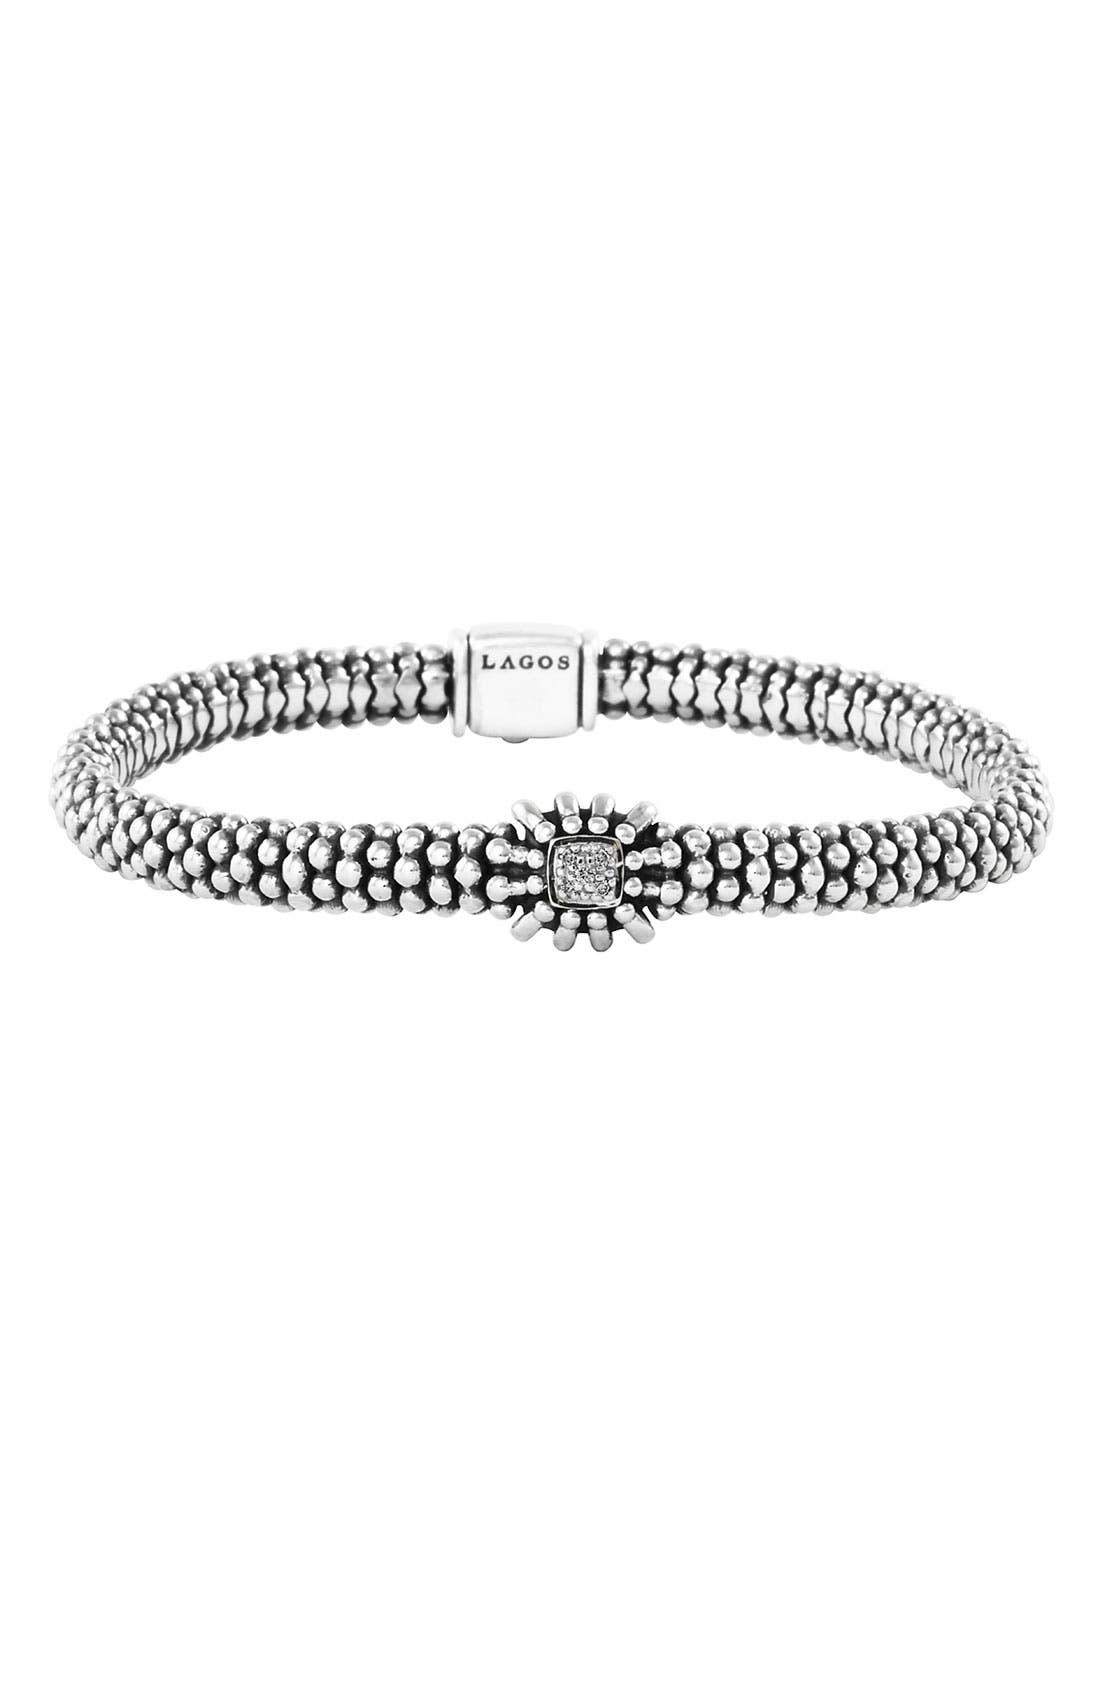 Main Image - LAGOS 'Prêt-à-Porter - Daisy' Diamond Caviar Rope Bracelet